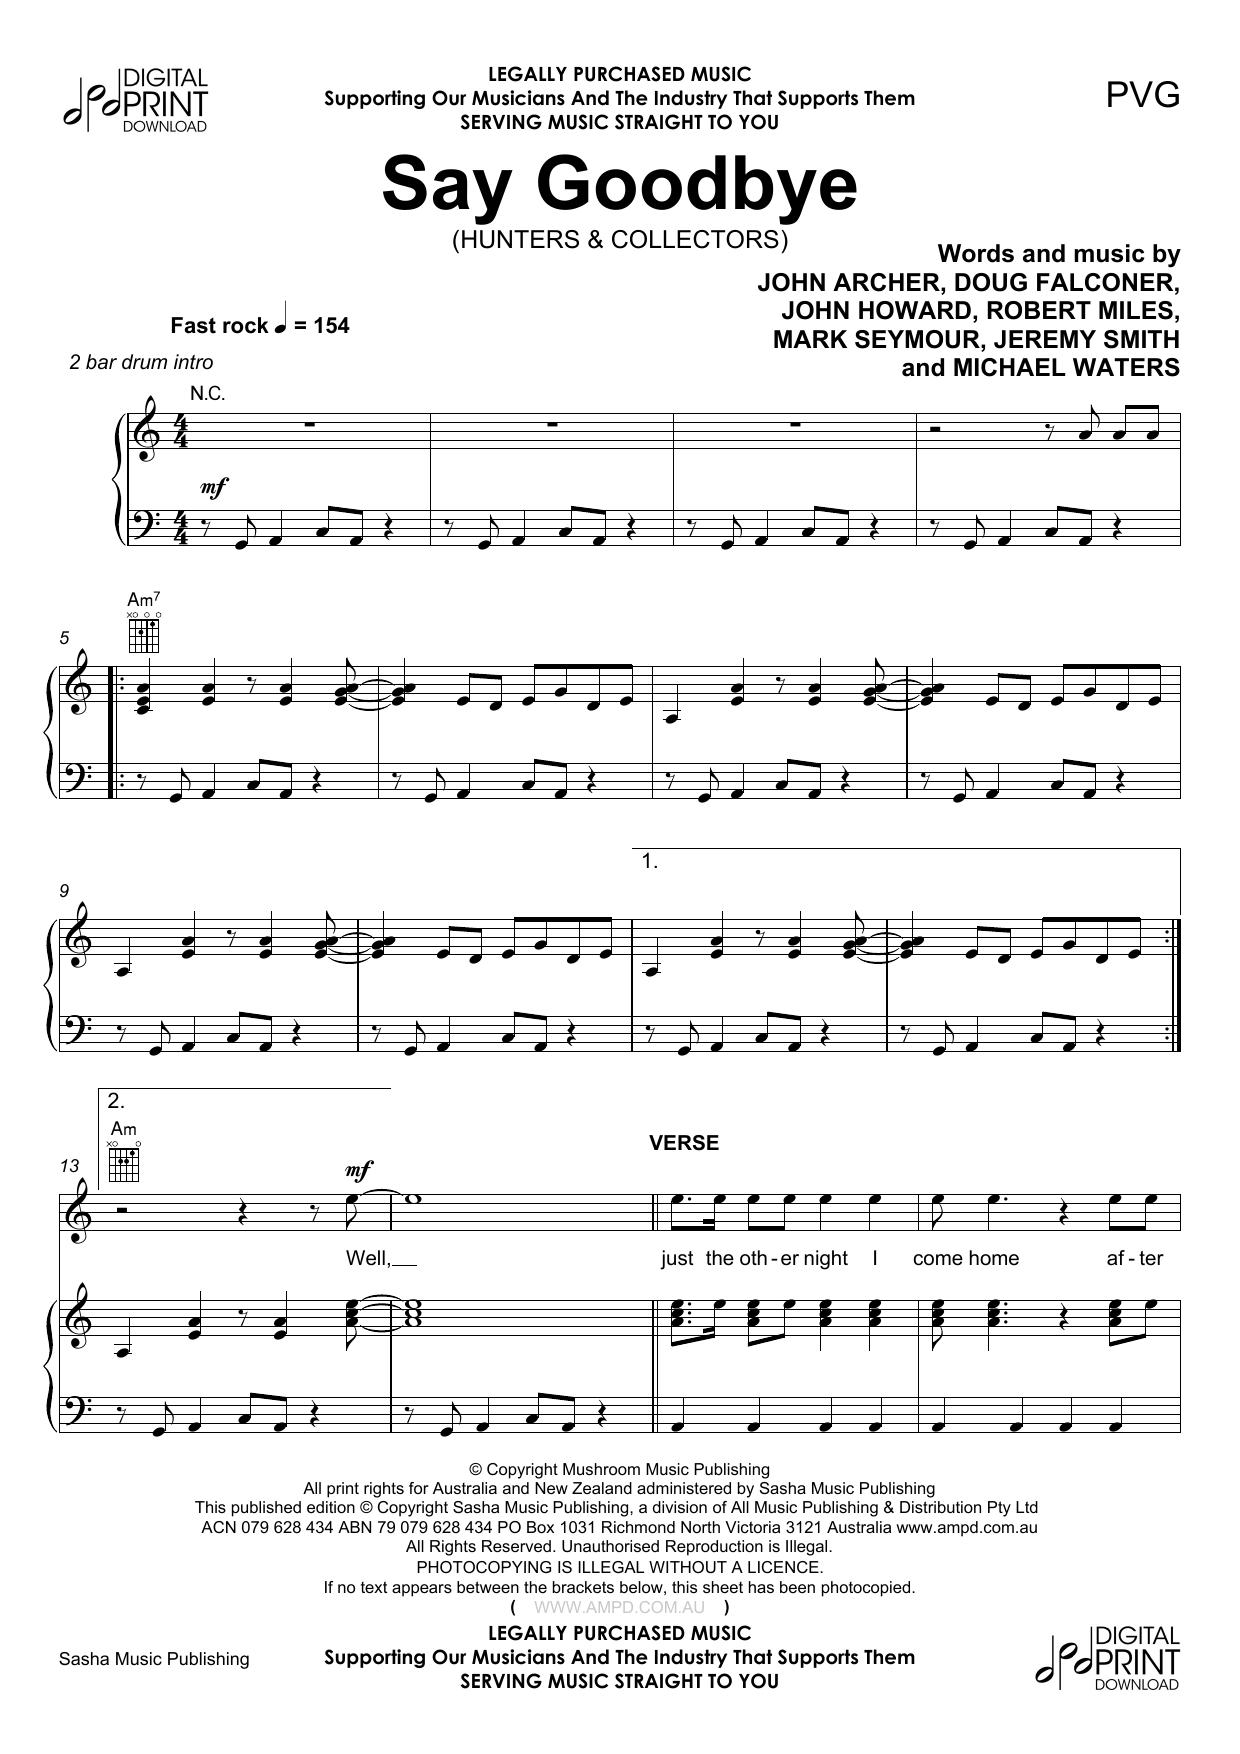 Hunters & Collectors Say Goodbye sheet music notes and chords. Download Printable PDF.